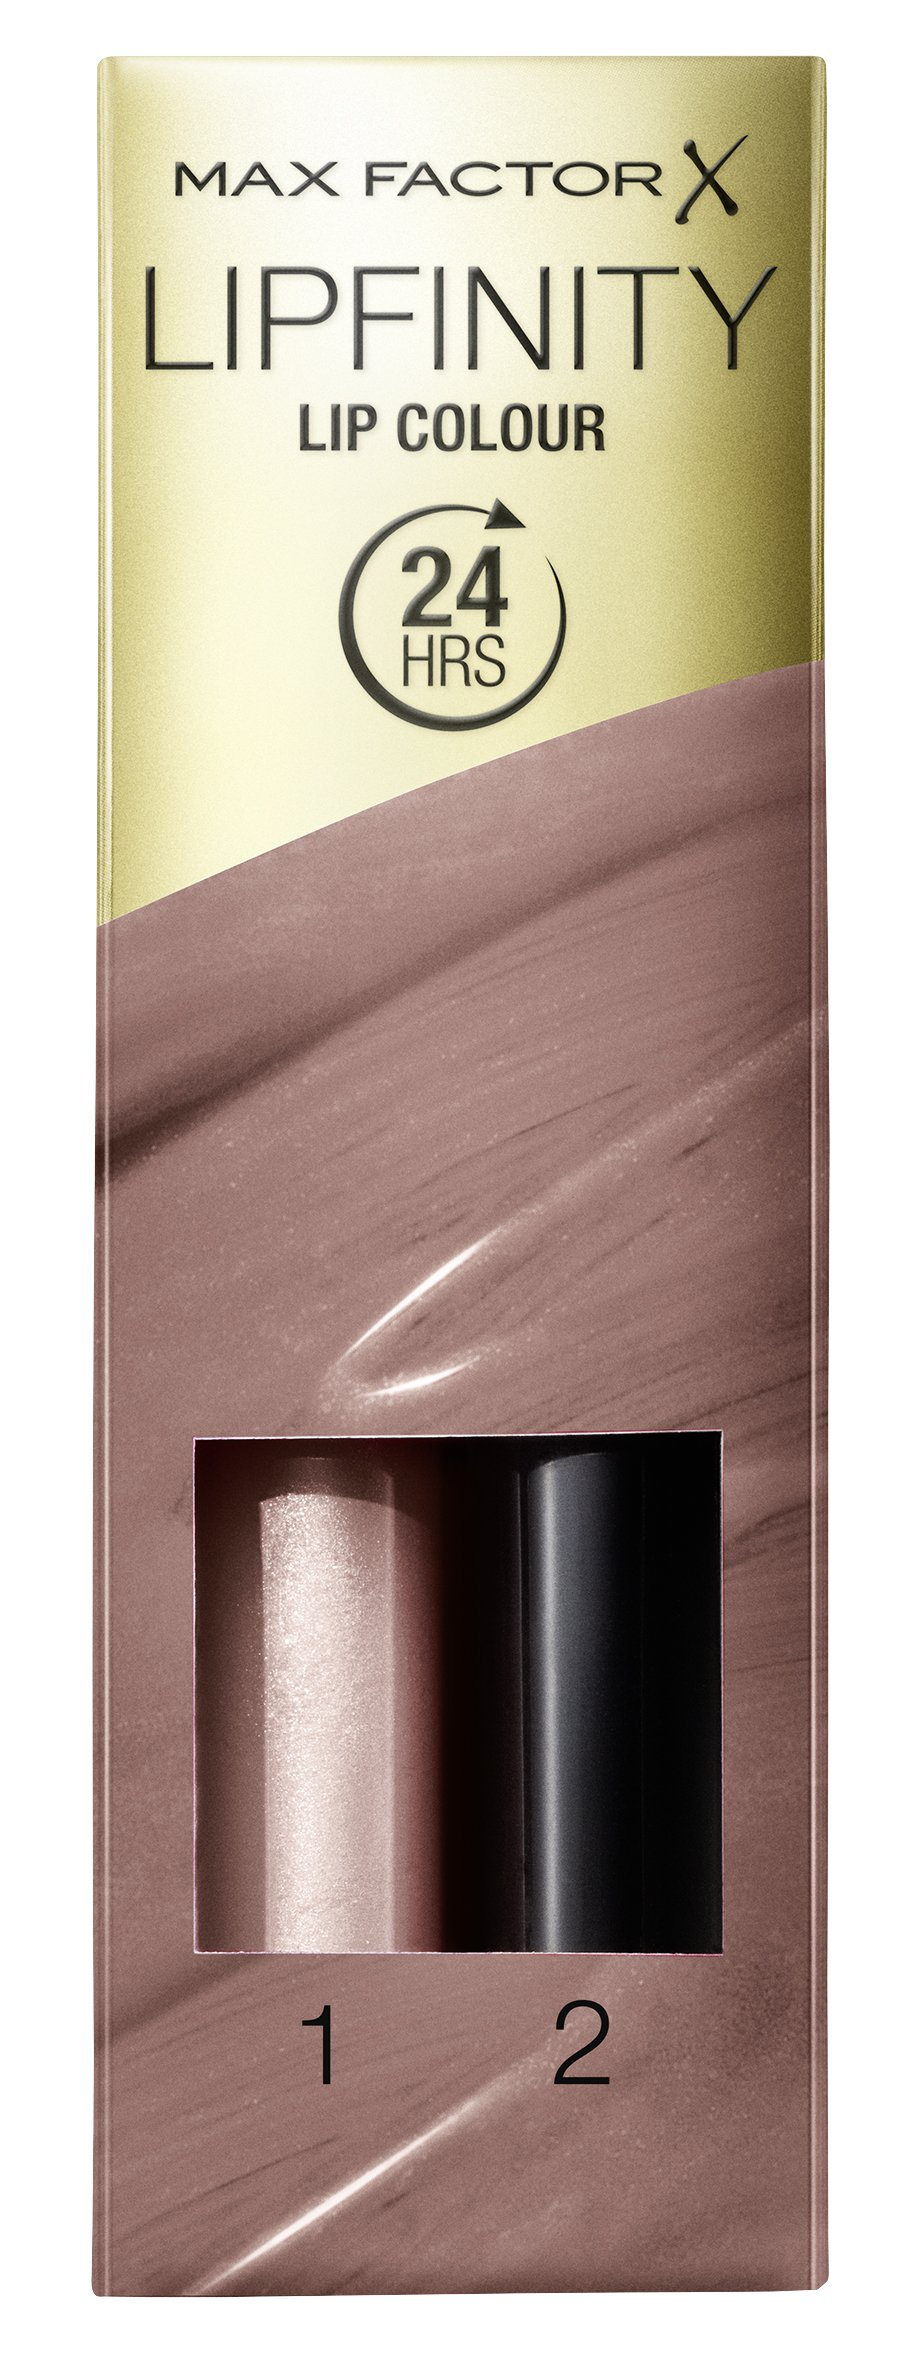 Max Factor Lipfinity rossetto, Indulgent numero 190